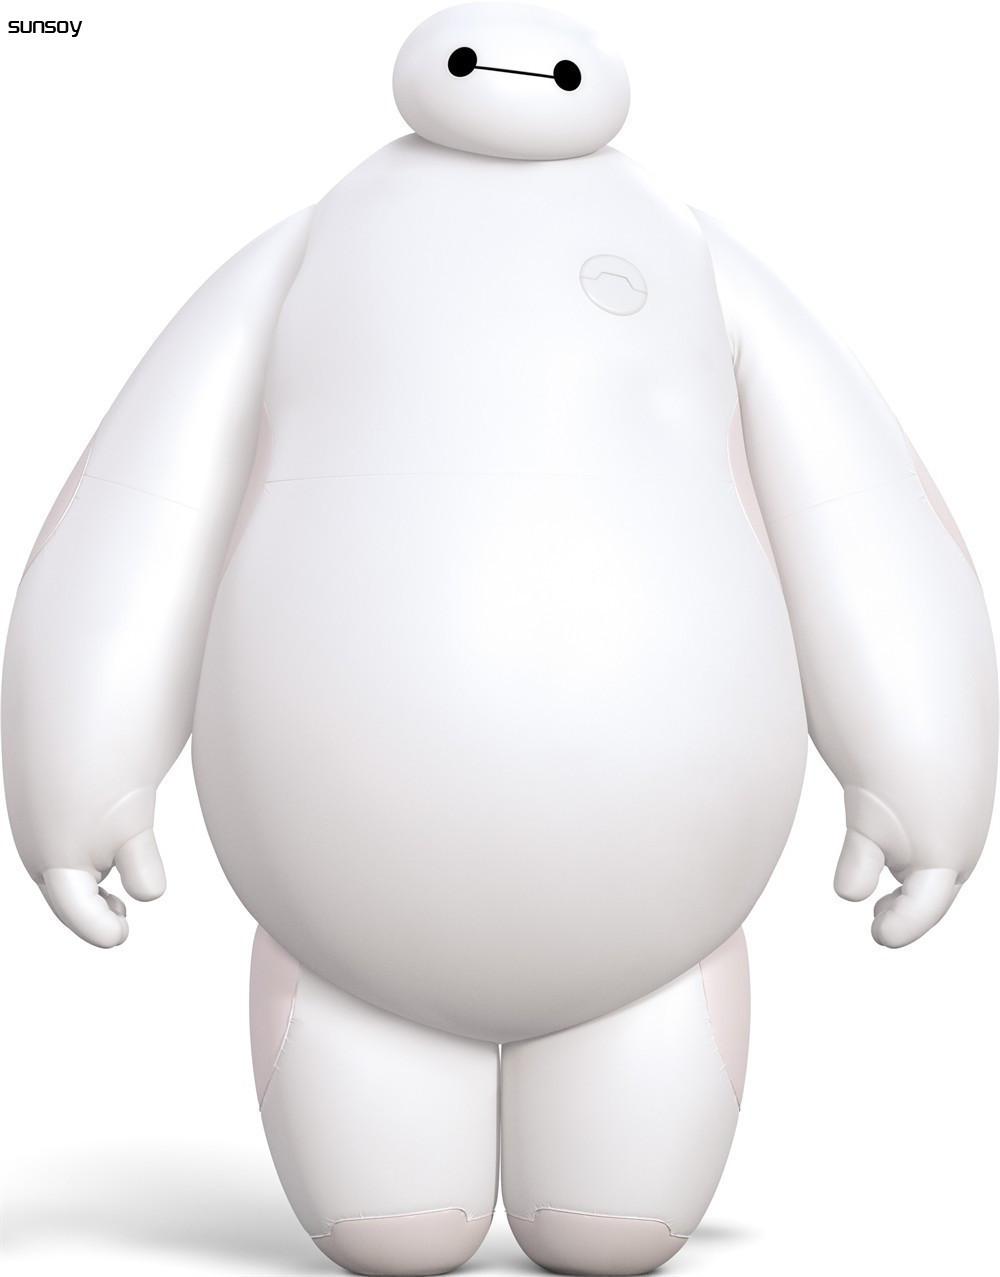 Larger clipart big hero 6 Doll 30cm & Super Robot